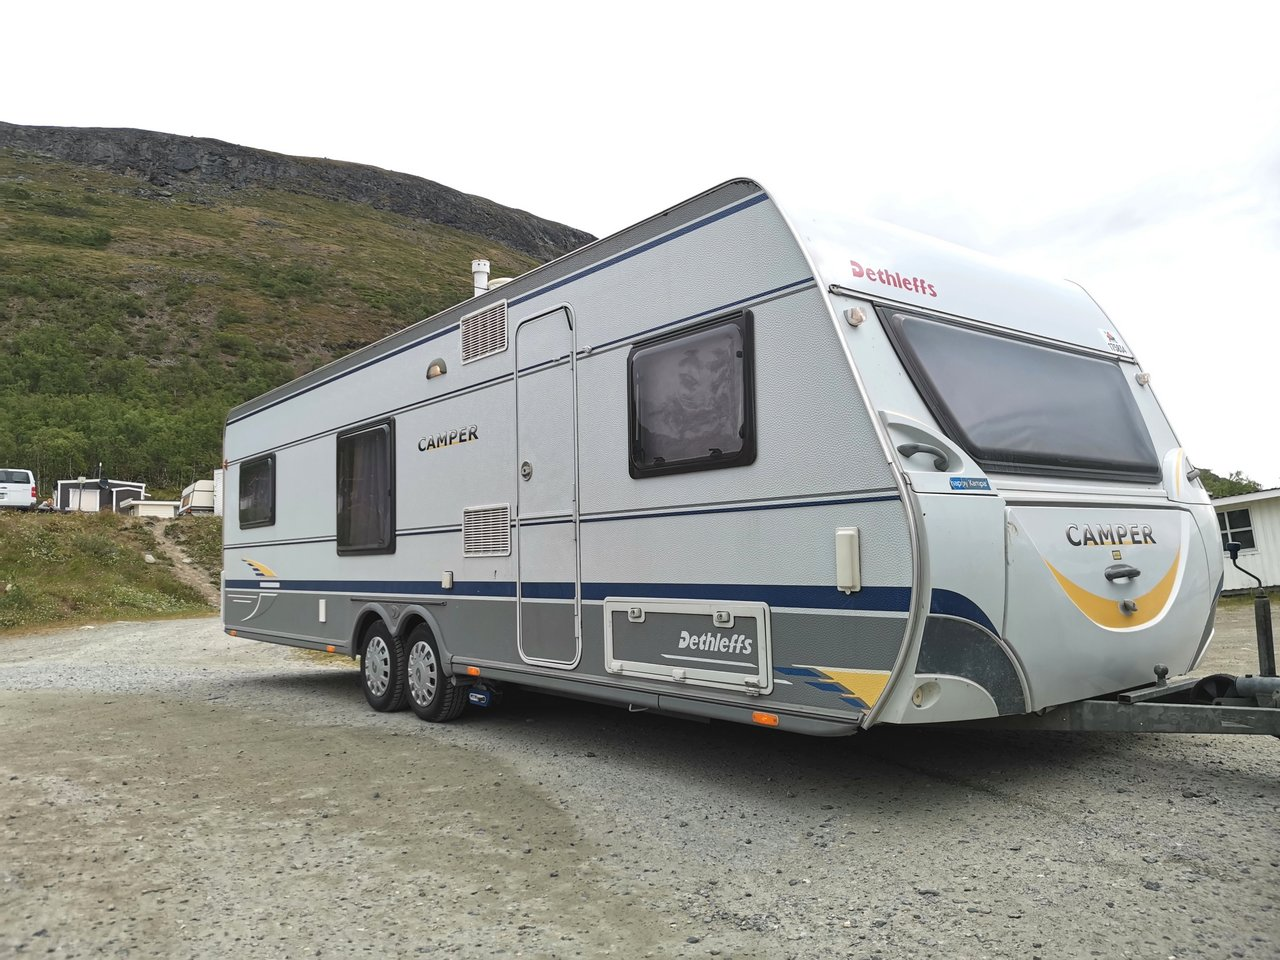 Kurkista lapsiperheen matkakotiin, Dethleffs Camper 740TK:n